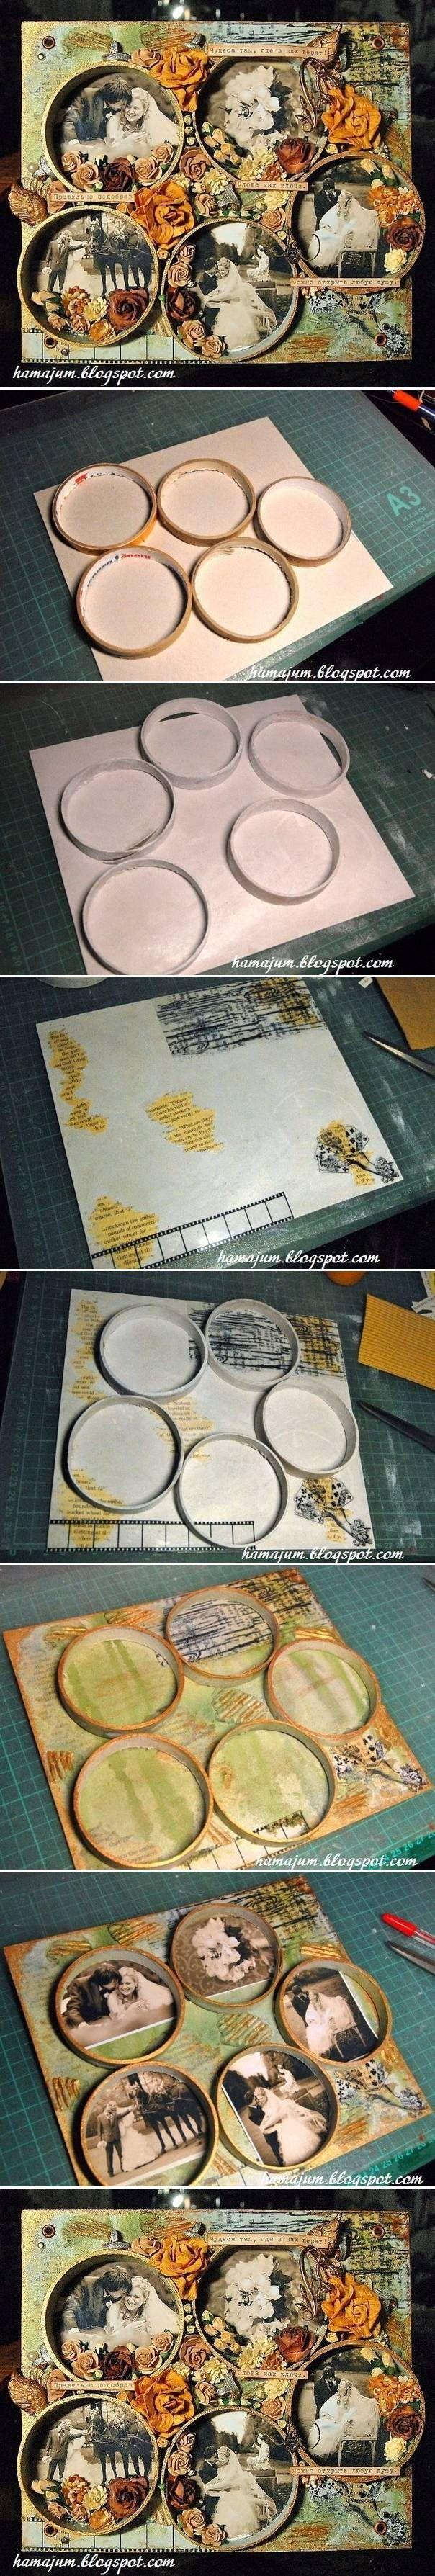 DIY Tape Reel Picture Frame DIY Projects | UsefulDIY.com